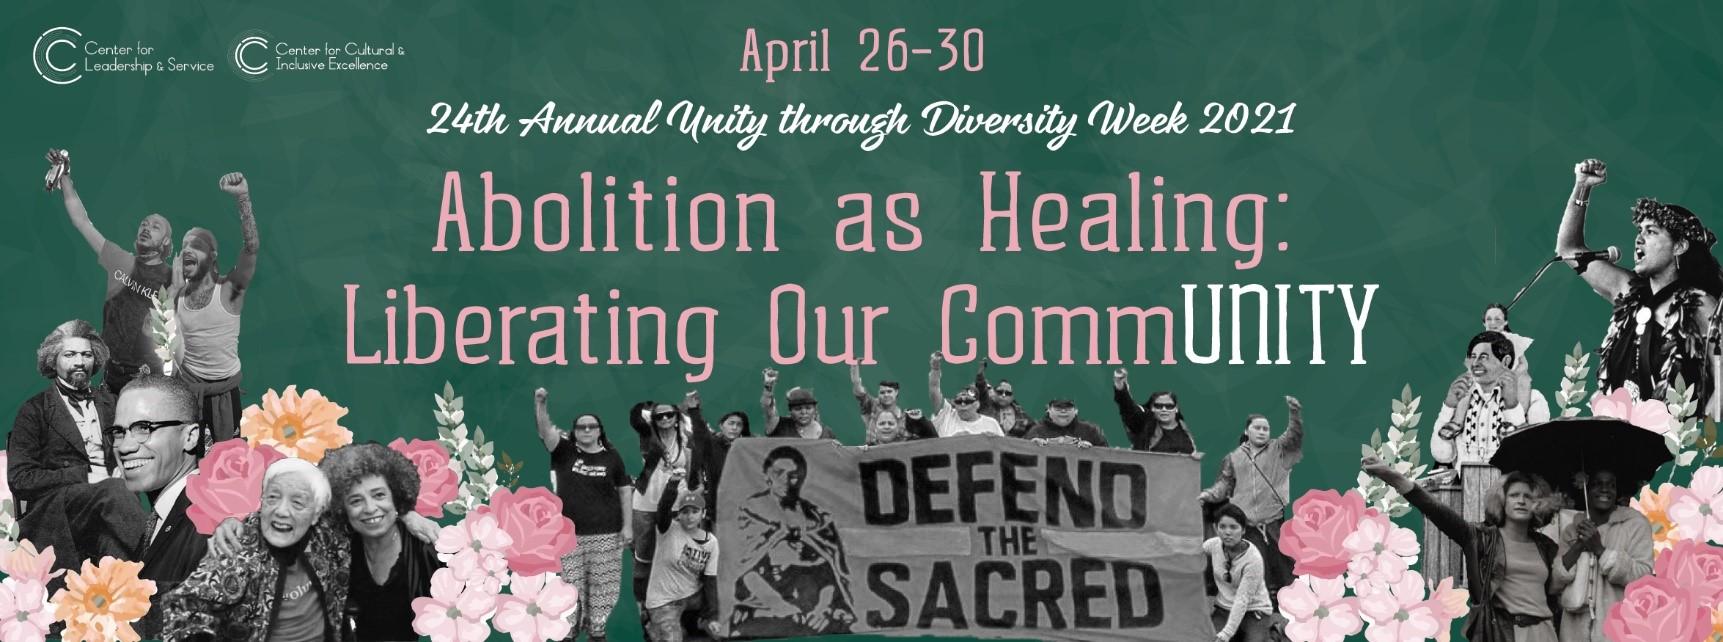 Figure 1. Unity Week Poster, Evergreen Background